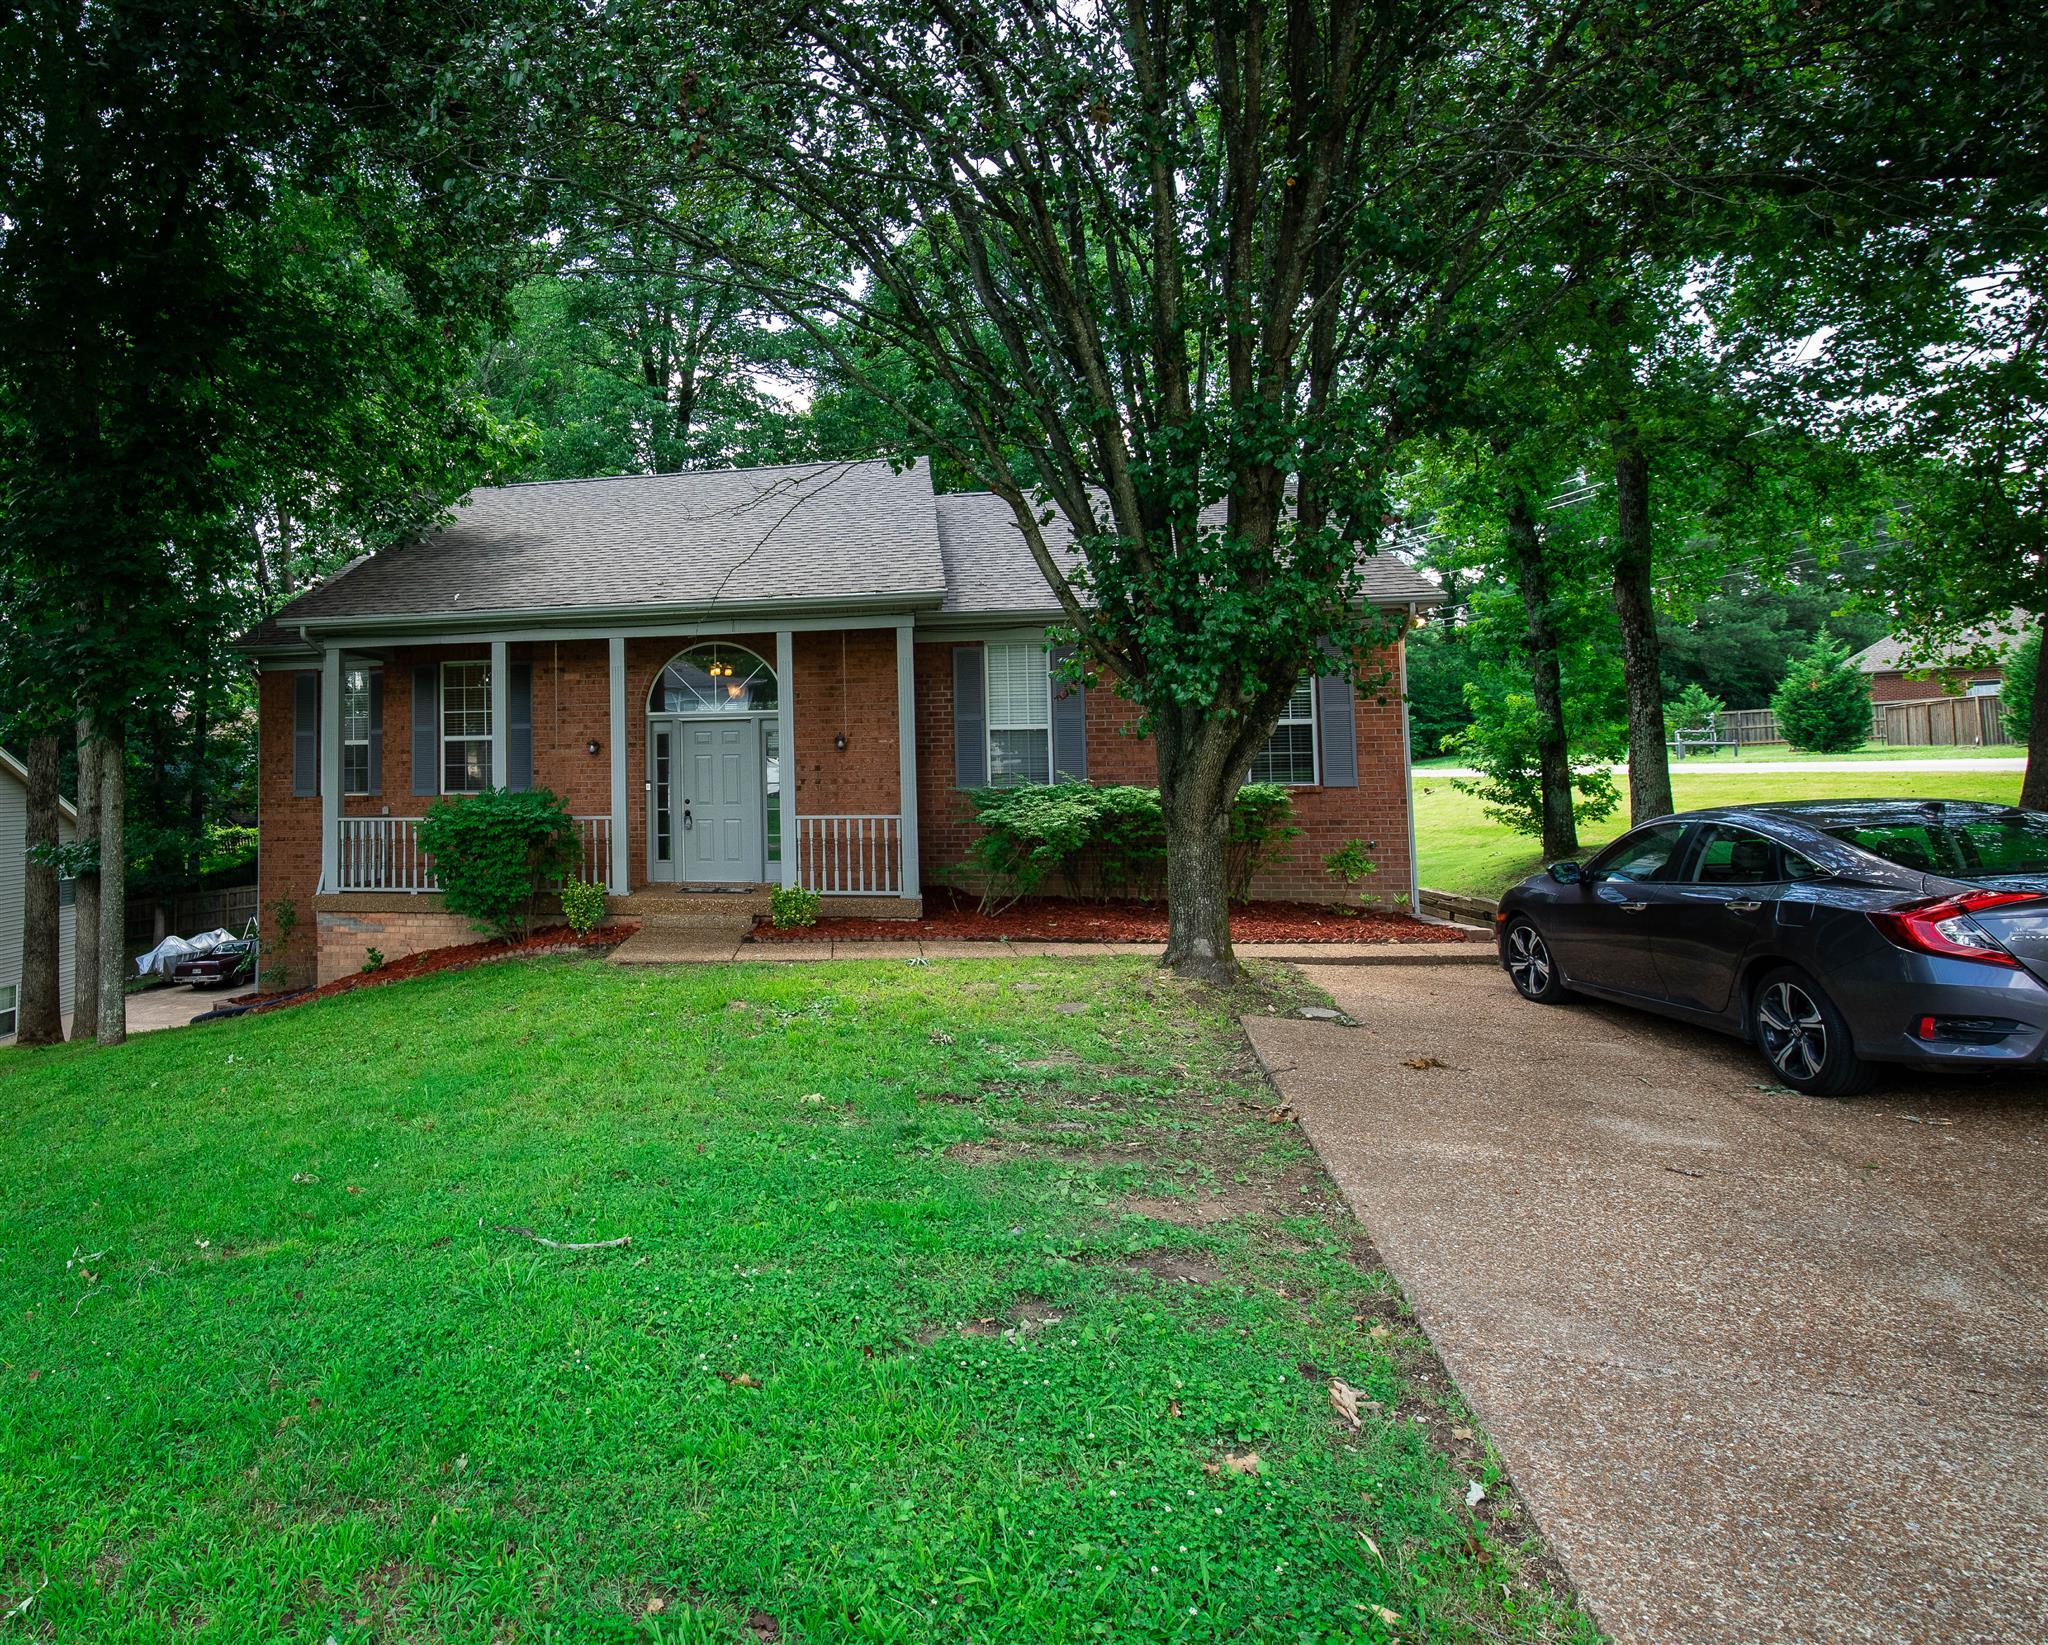 1000 Tulip Grove Rd, Hermitage, TN 37076 - Hermitage, TN real estate listing